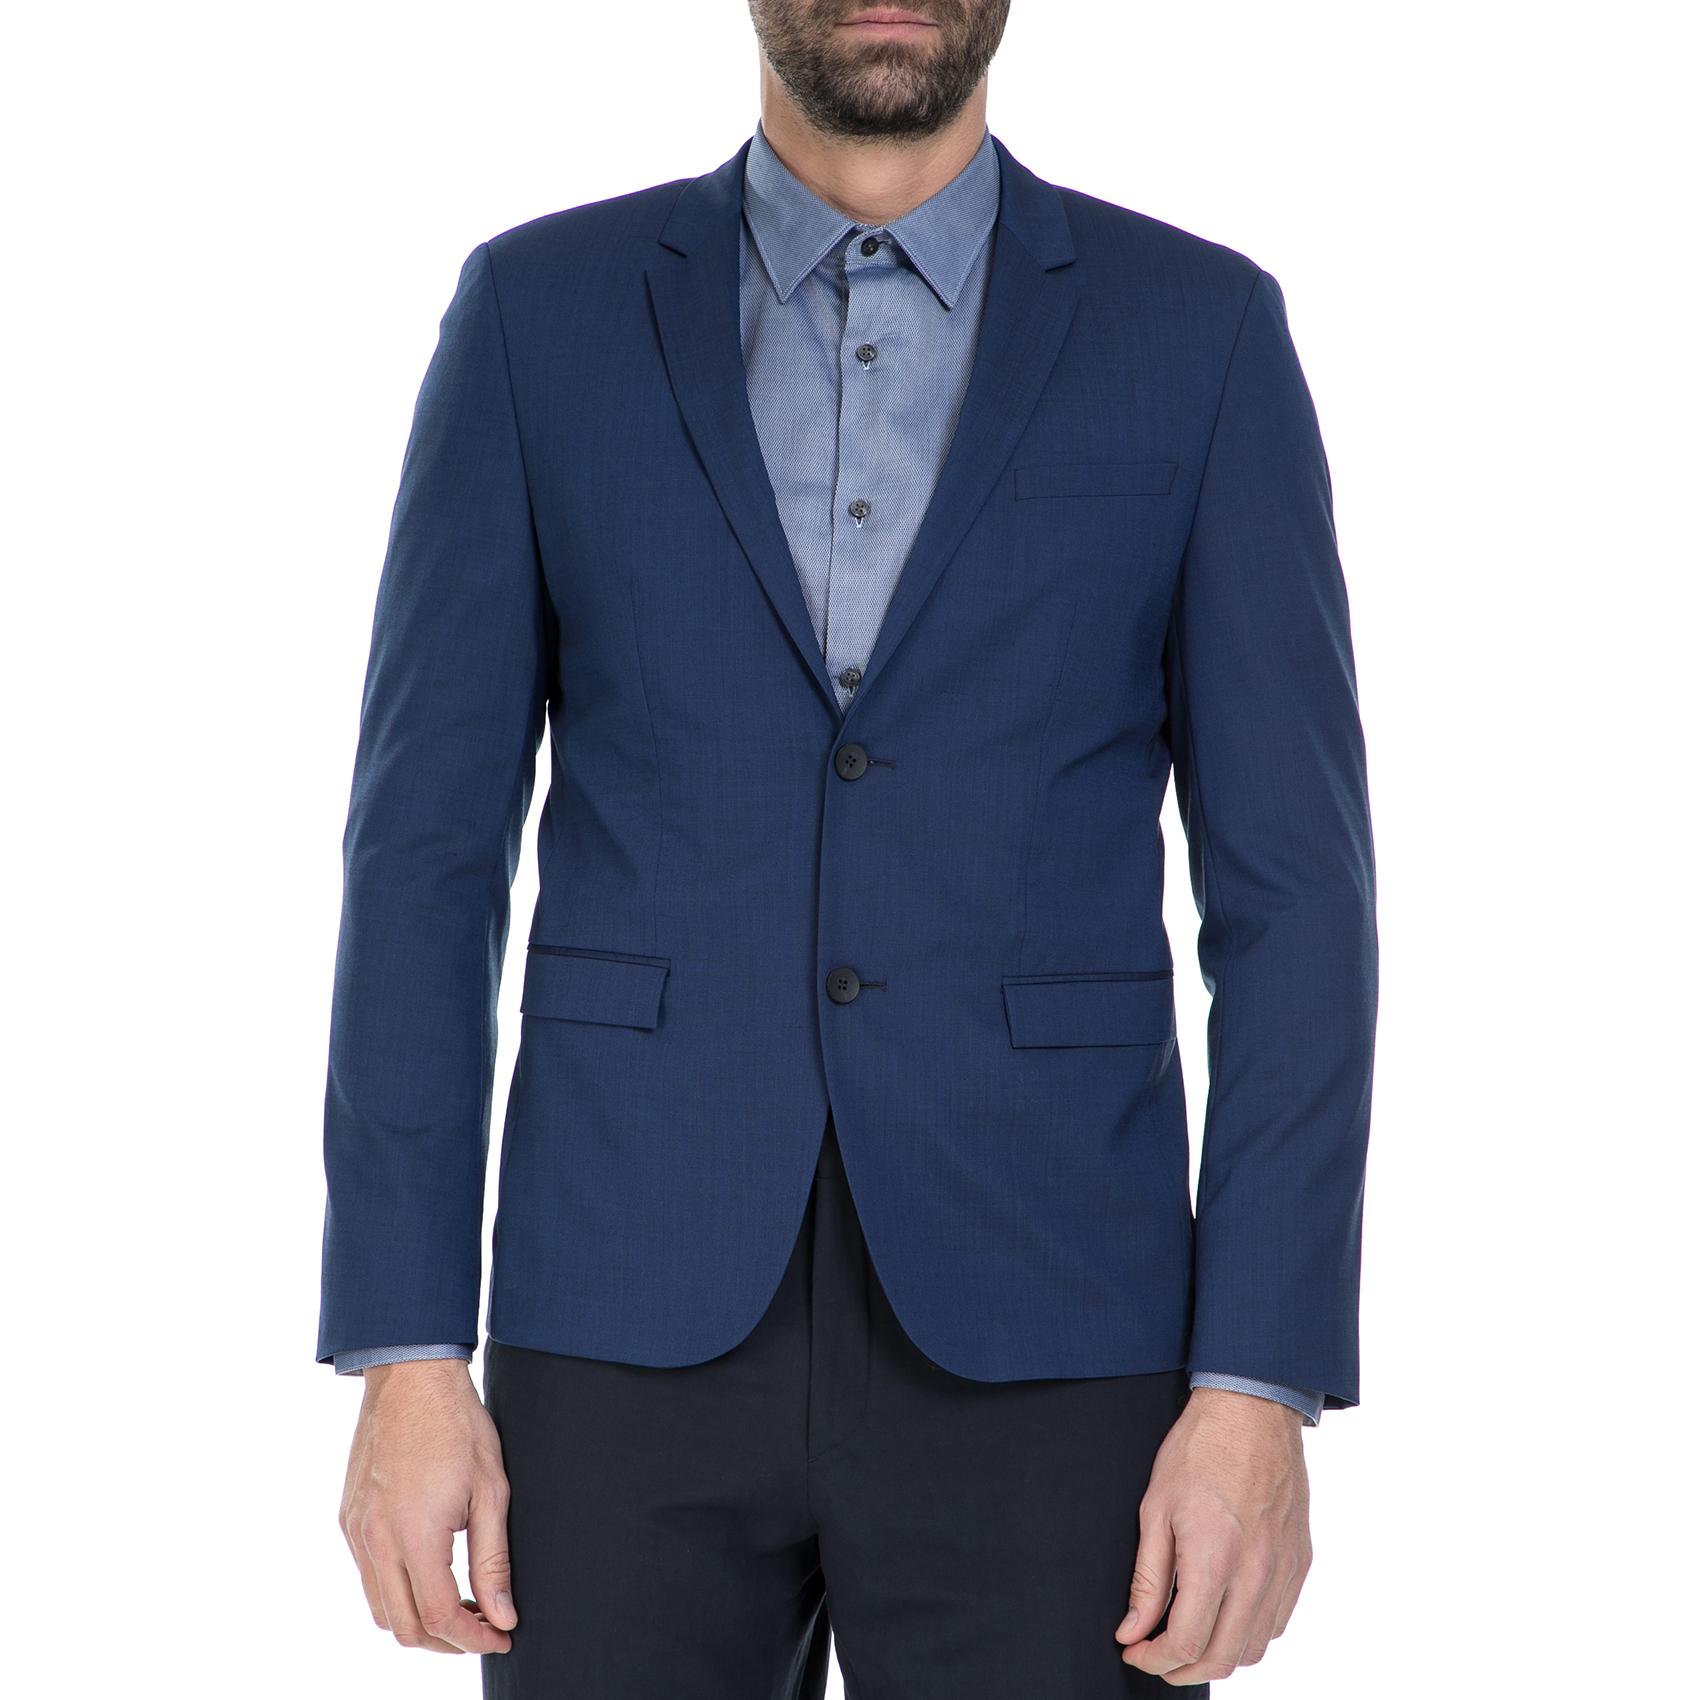 CK – Ανδρικό σακάκι CK μπλε